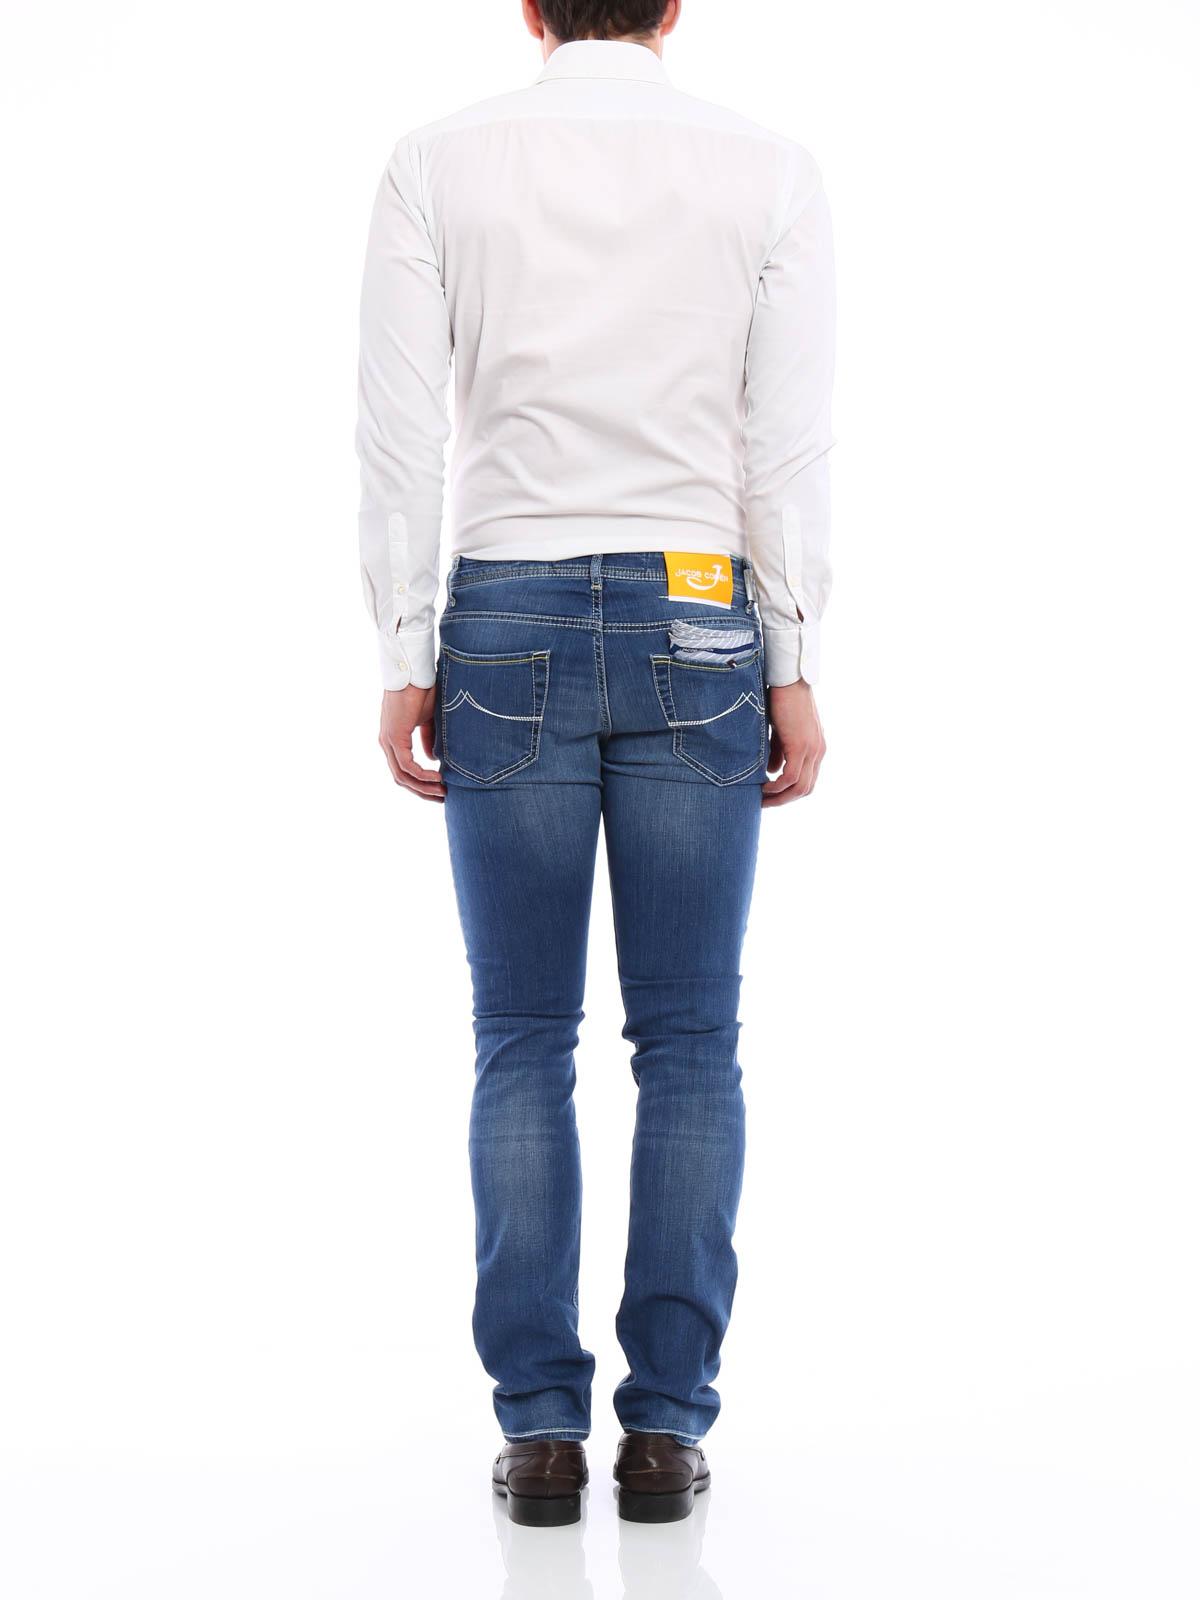 jeans sartoriali jacob cohen jeans dritti a sigaretta. Black Bedroom Furniture Sets. Home Design Ideas